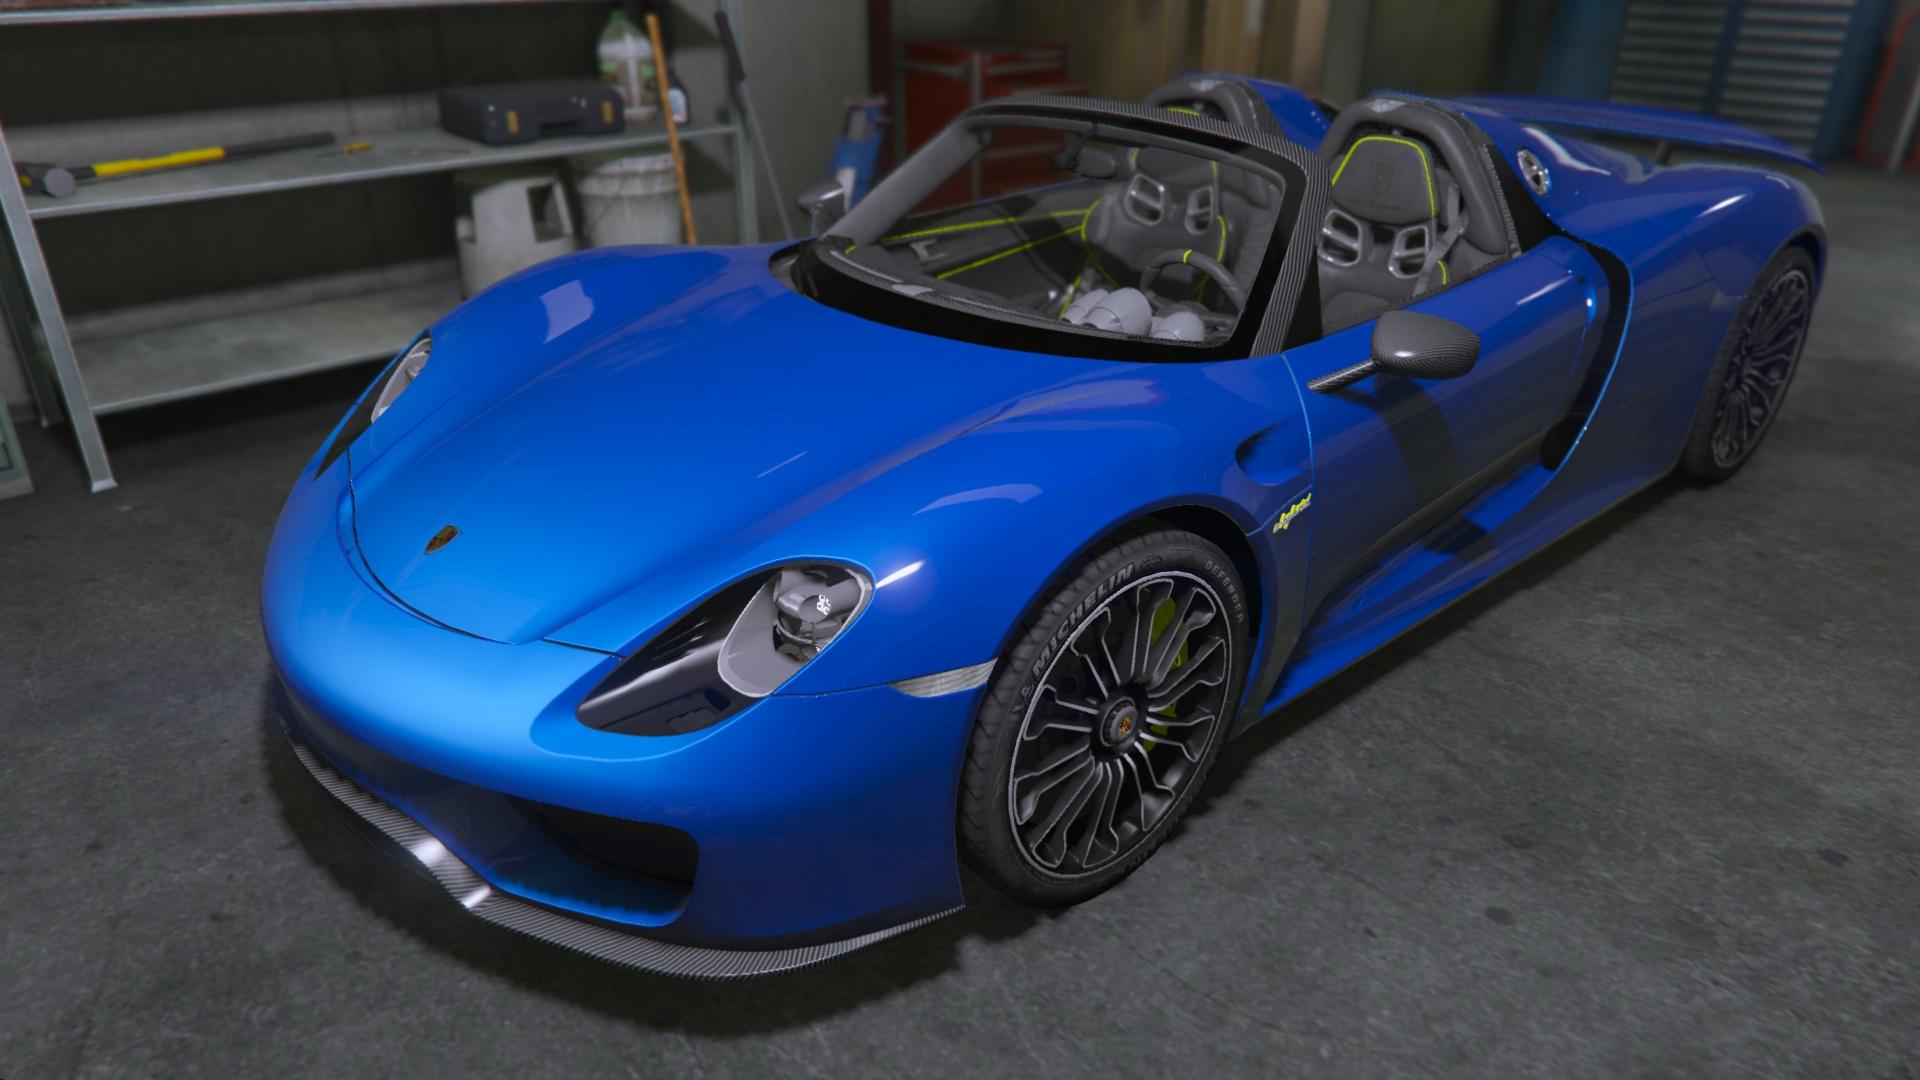 7433e7-GTA5%202015-09-13%2020-56-34-96_%E7%9C%8B%E5%9B%BE%E7%8E%8B Stunning Porsche 918 Spyder Paint Job Cars Trend